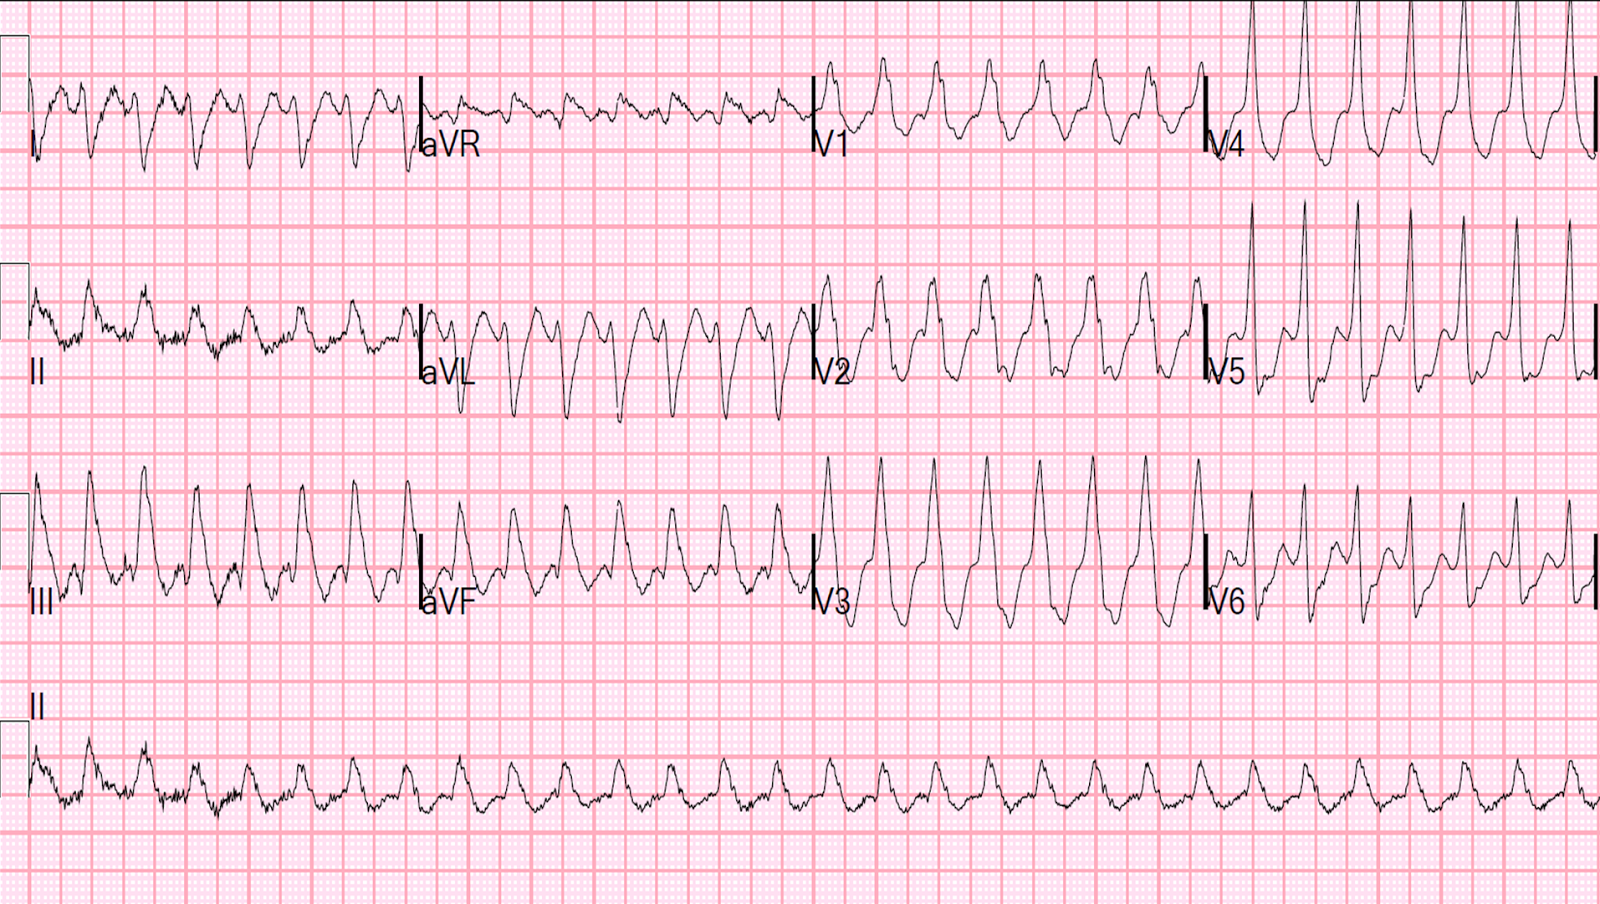 Lewis Lead 12 Ekg Diagram House Wiring Symbols Dr Smith S Ecg Blog Wide Complex Tachycardia Leads Do Not Rh Hqmeded Blogspot